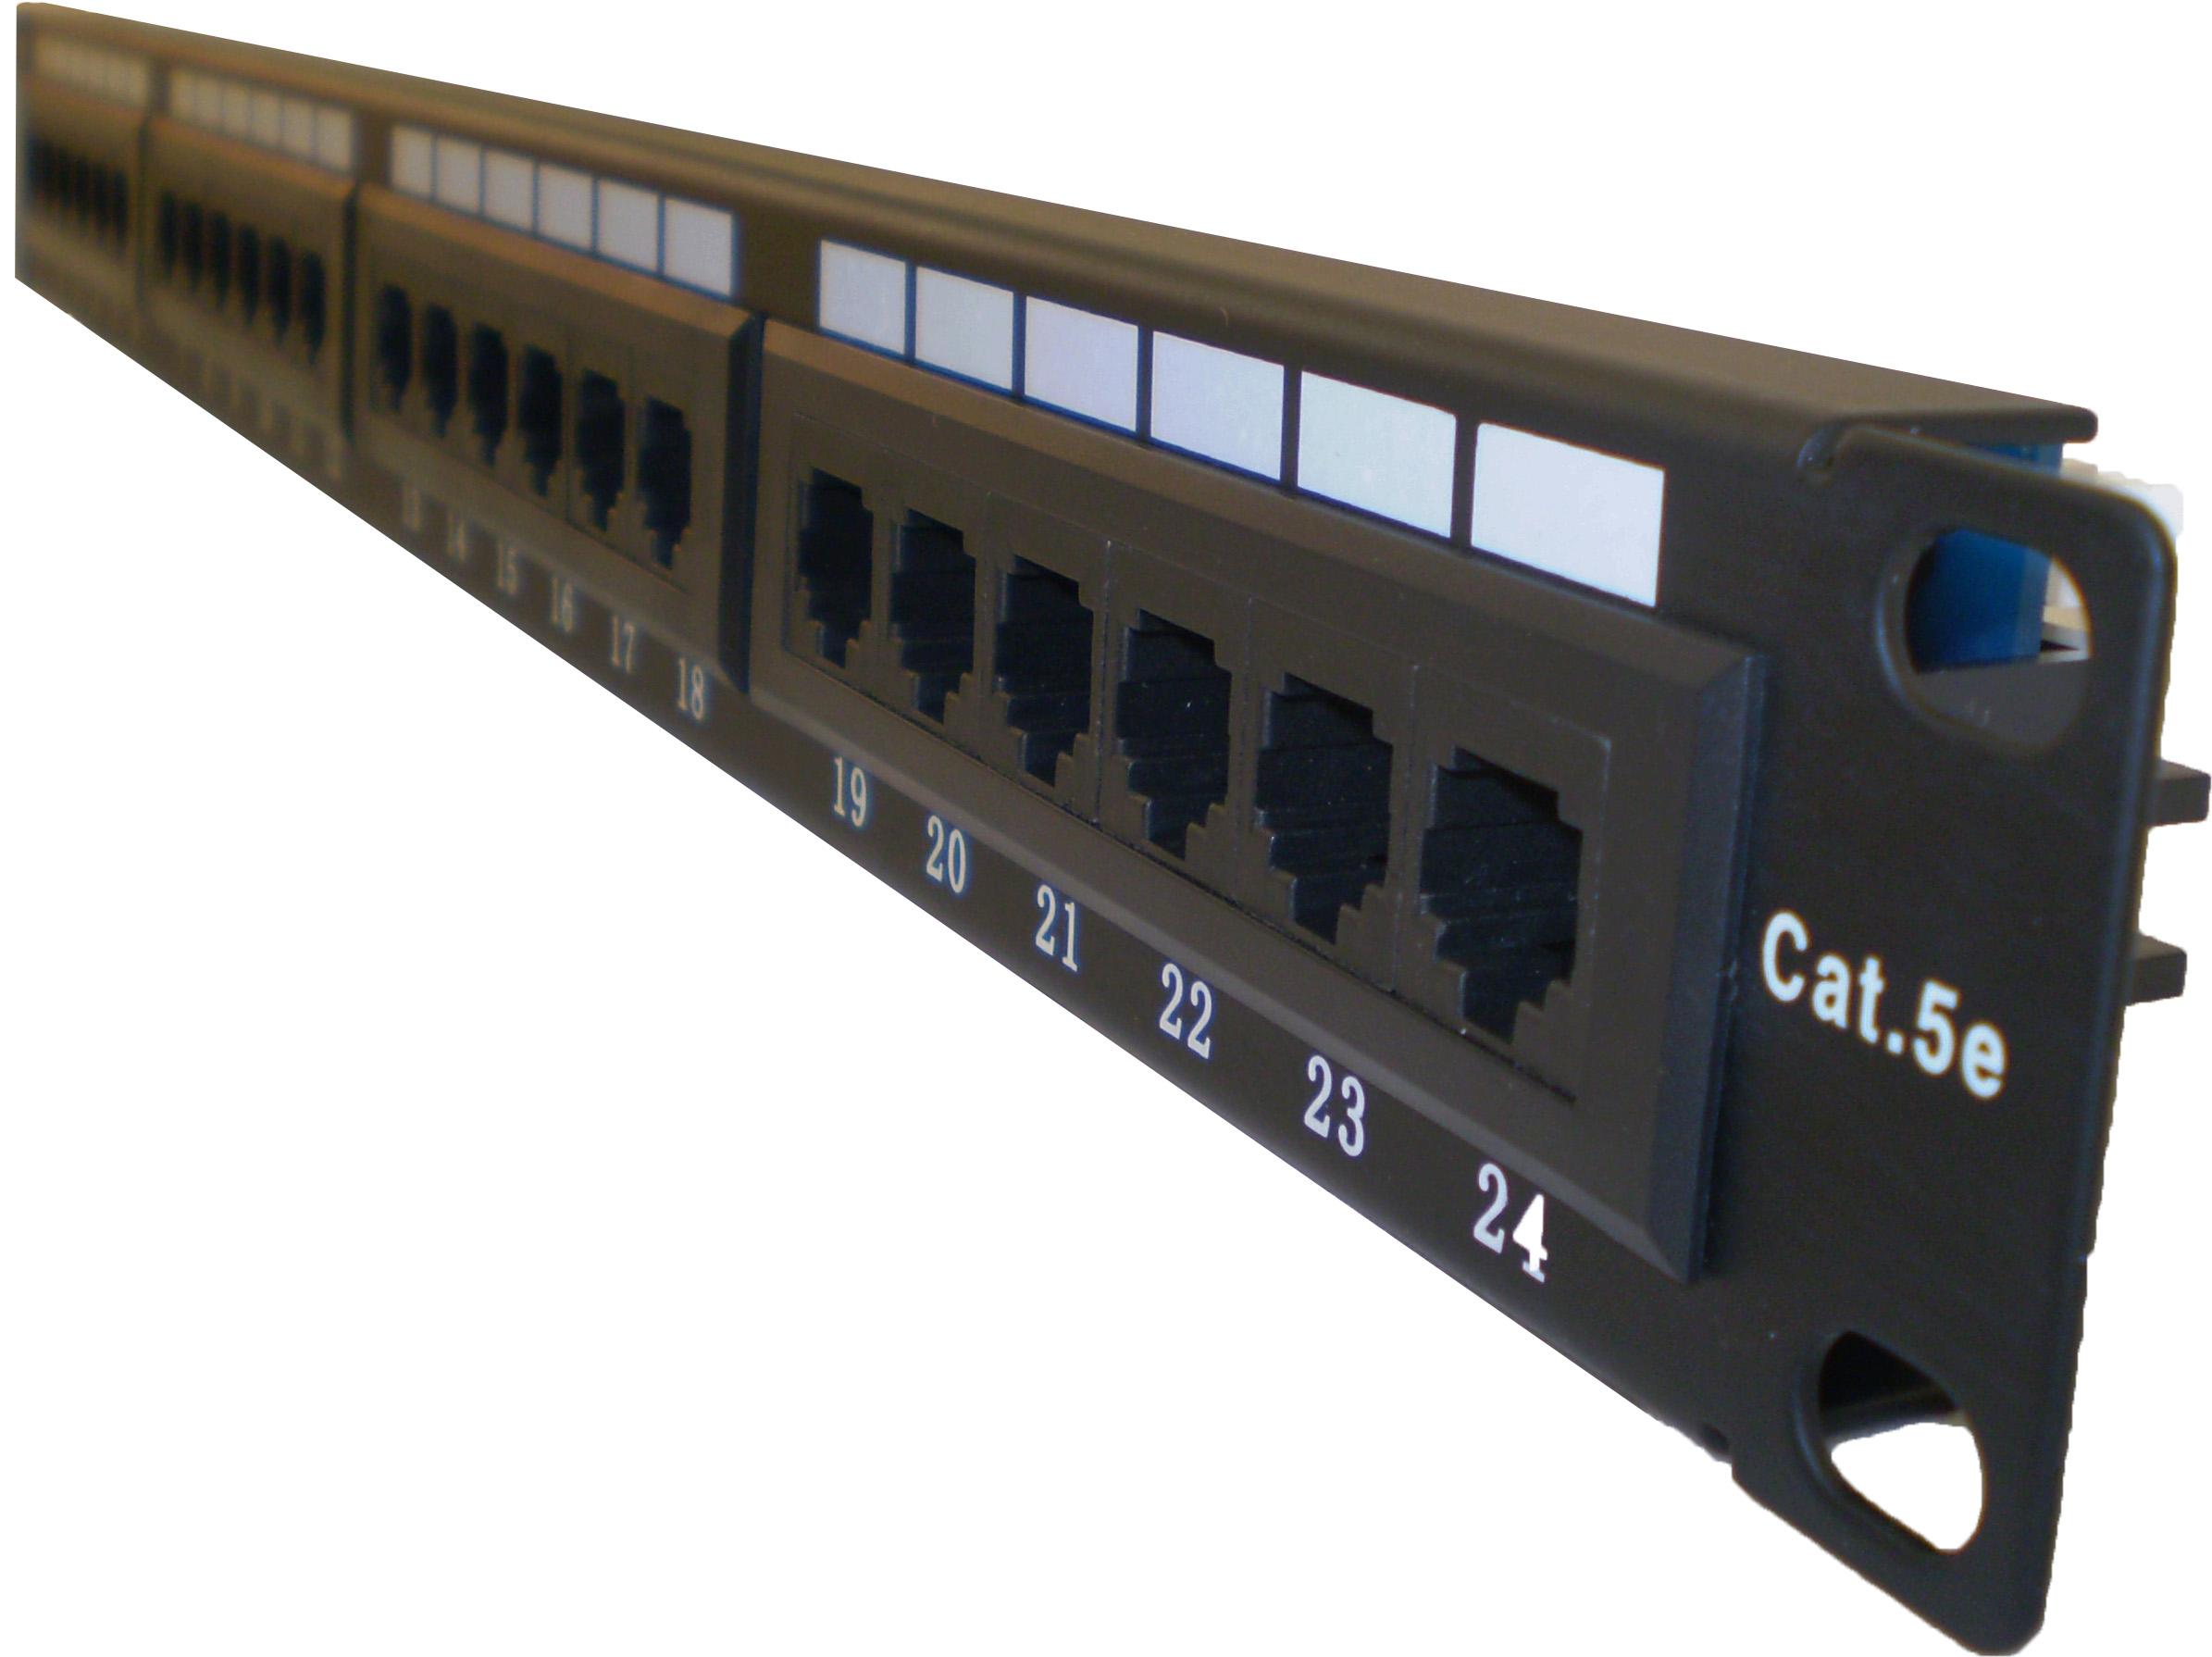 Ovaltel Acton Cabling Solution Pp245e 1 Patch Panel 24 Ports Cable Solutions Cat5e Cables Port Cat 5e